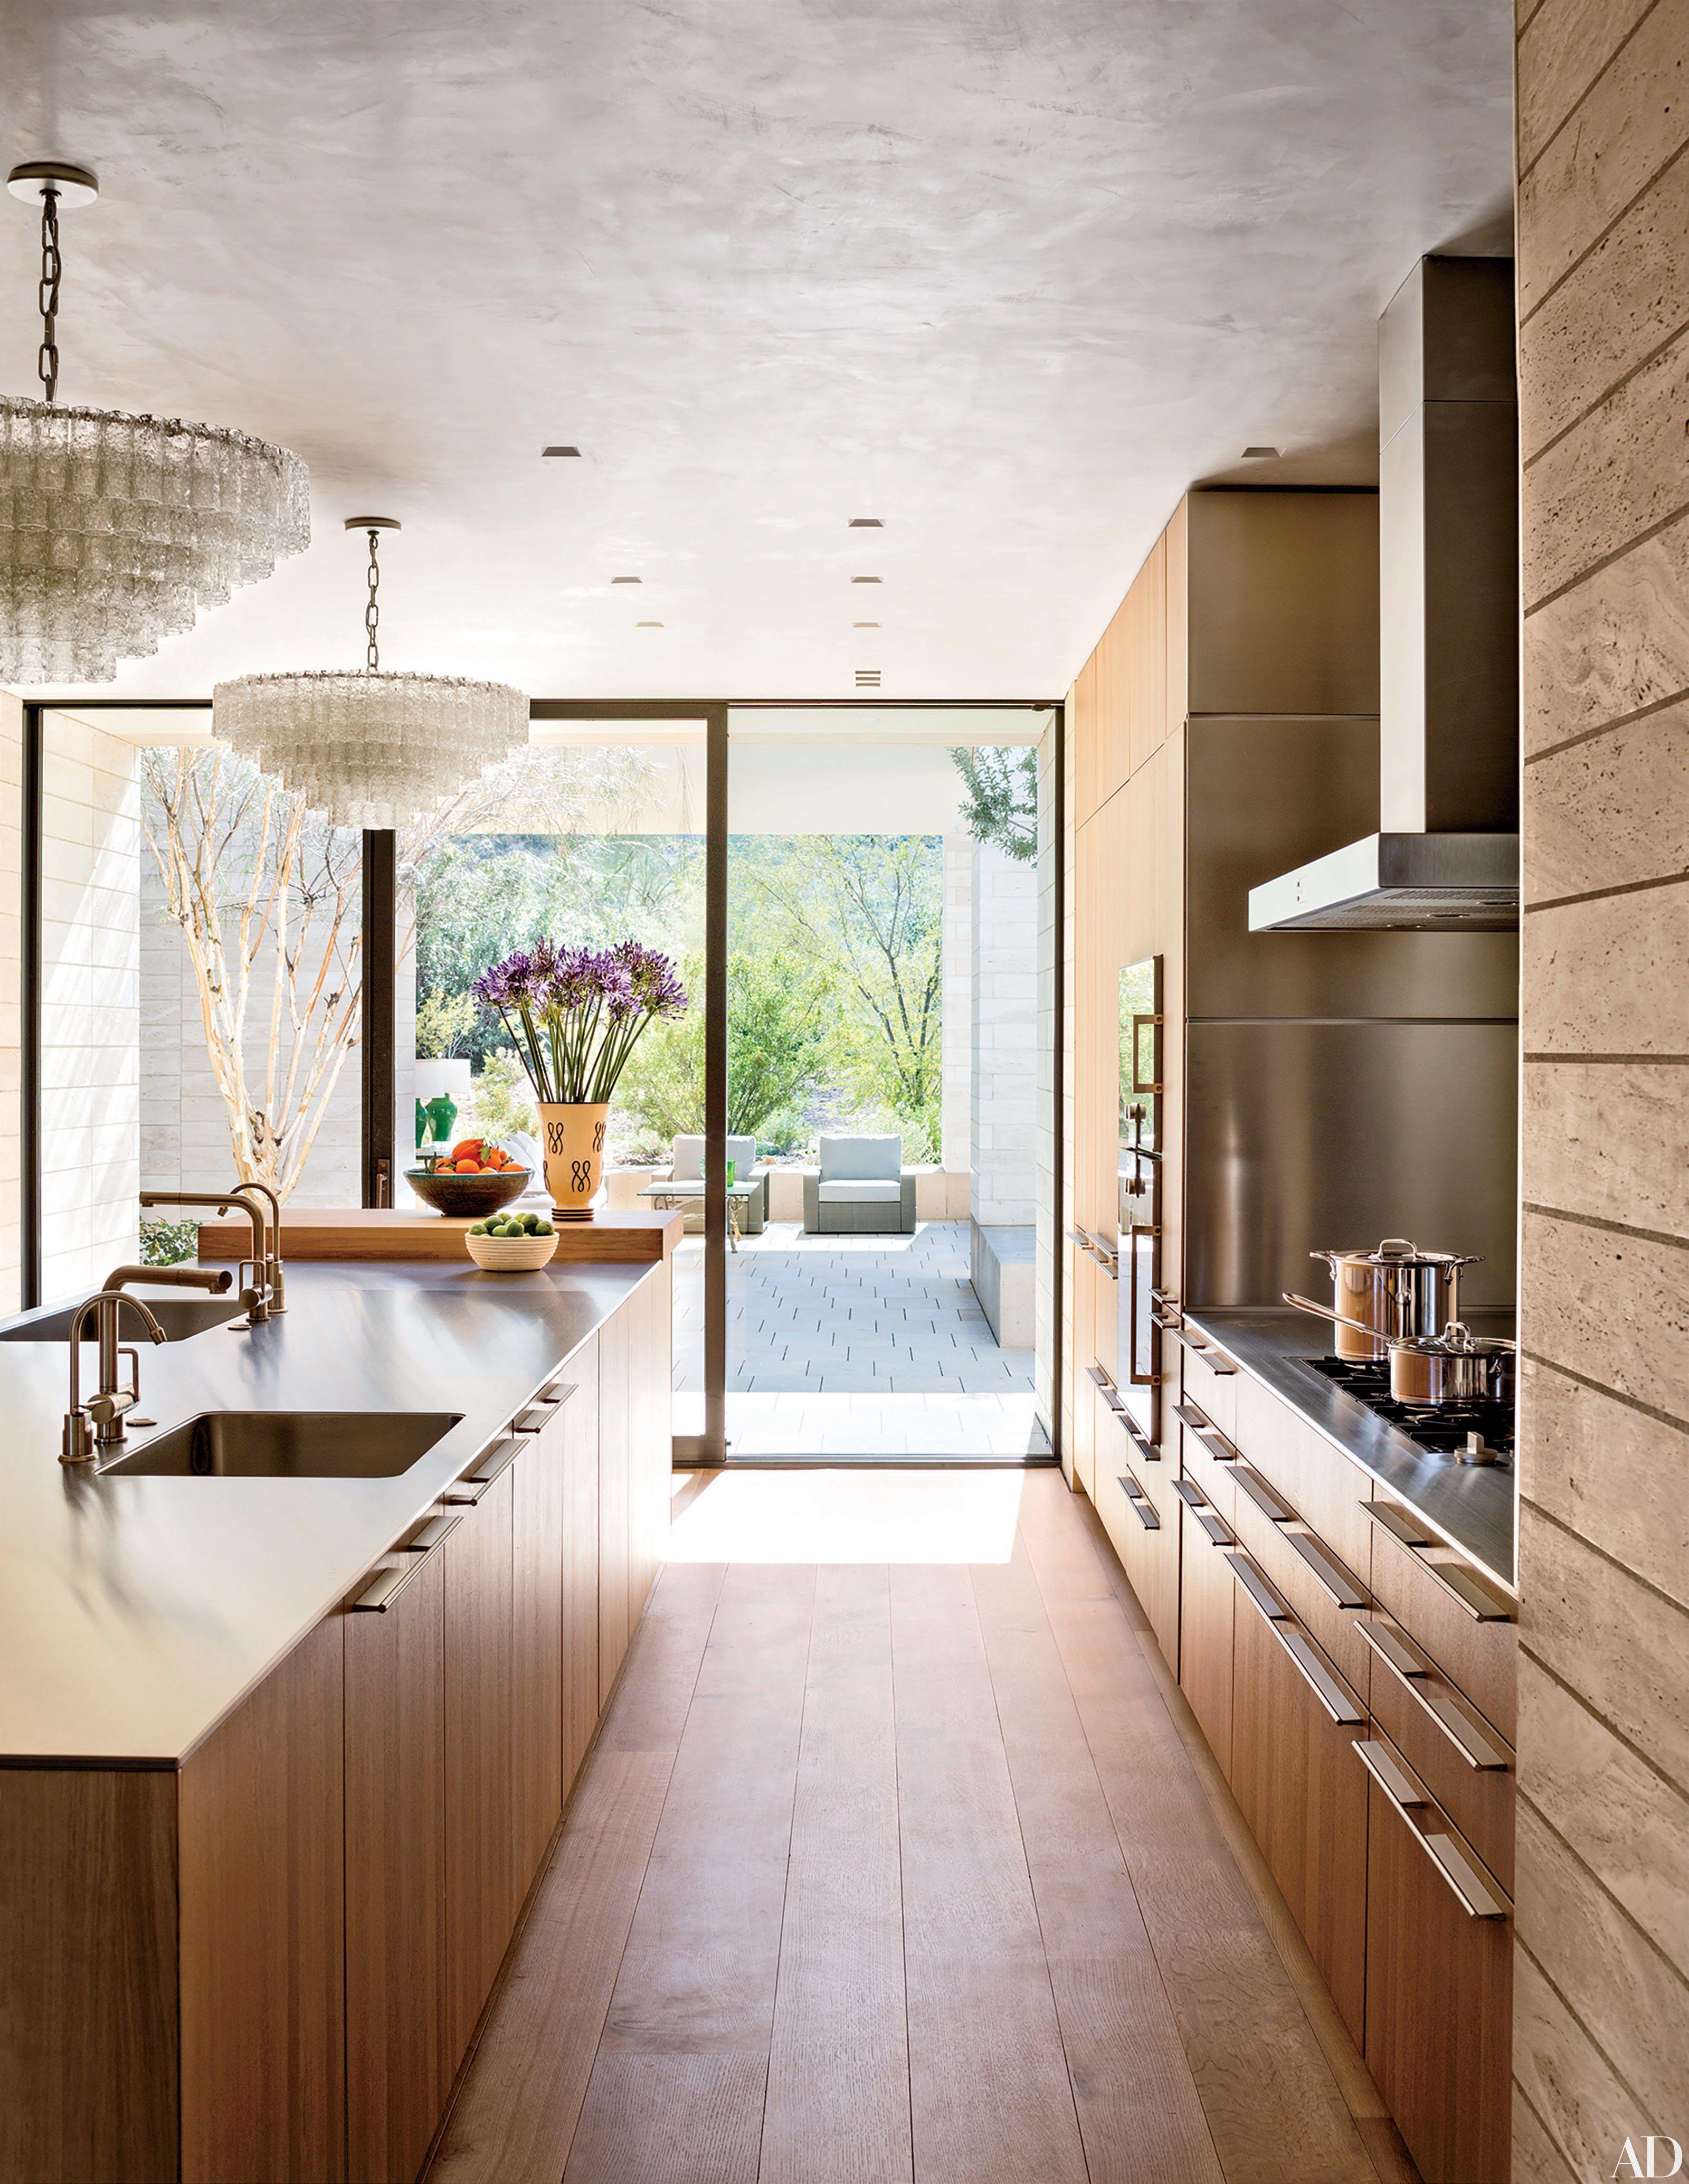 9 Kitchens With Plenty of Natural Light   Sleek kitchen ...